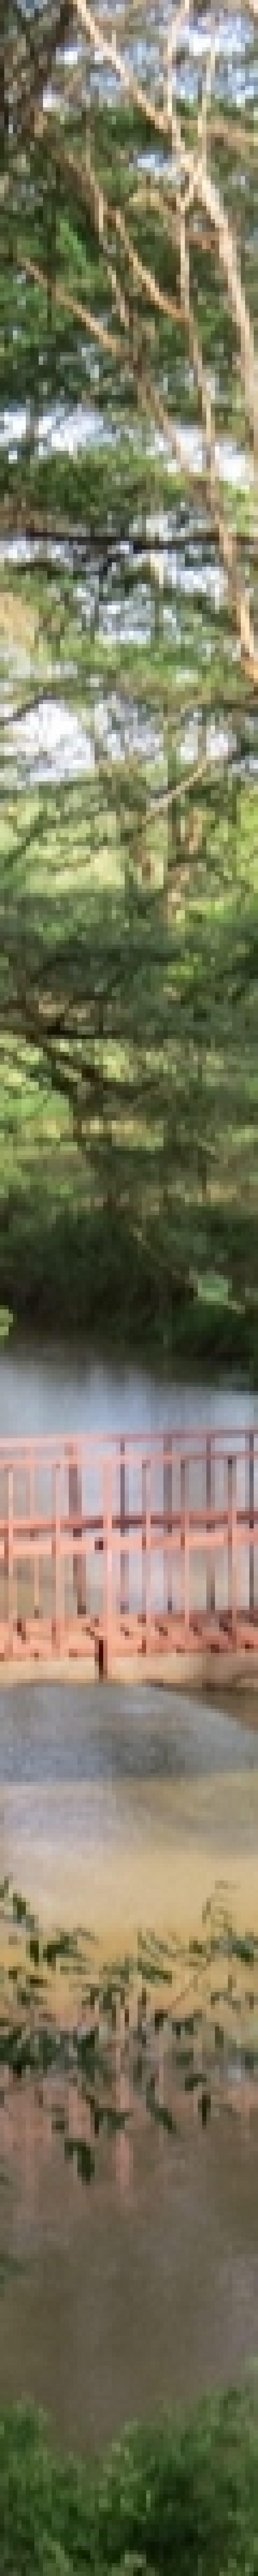 Bridge over River Sante Copyright Rupi Mangat